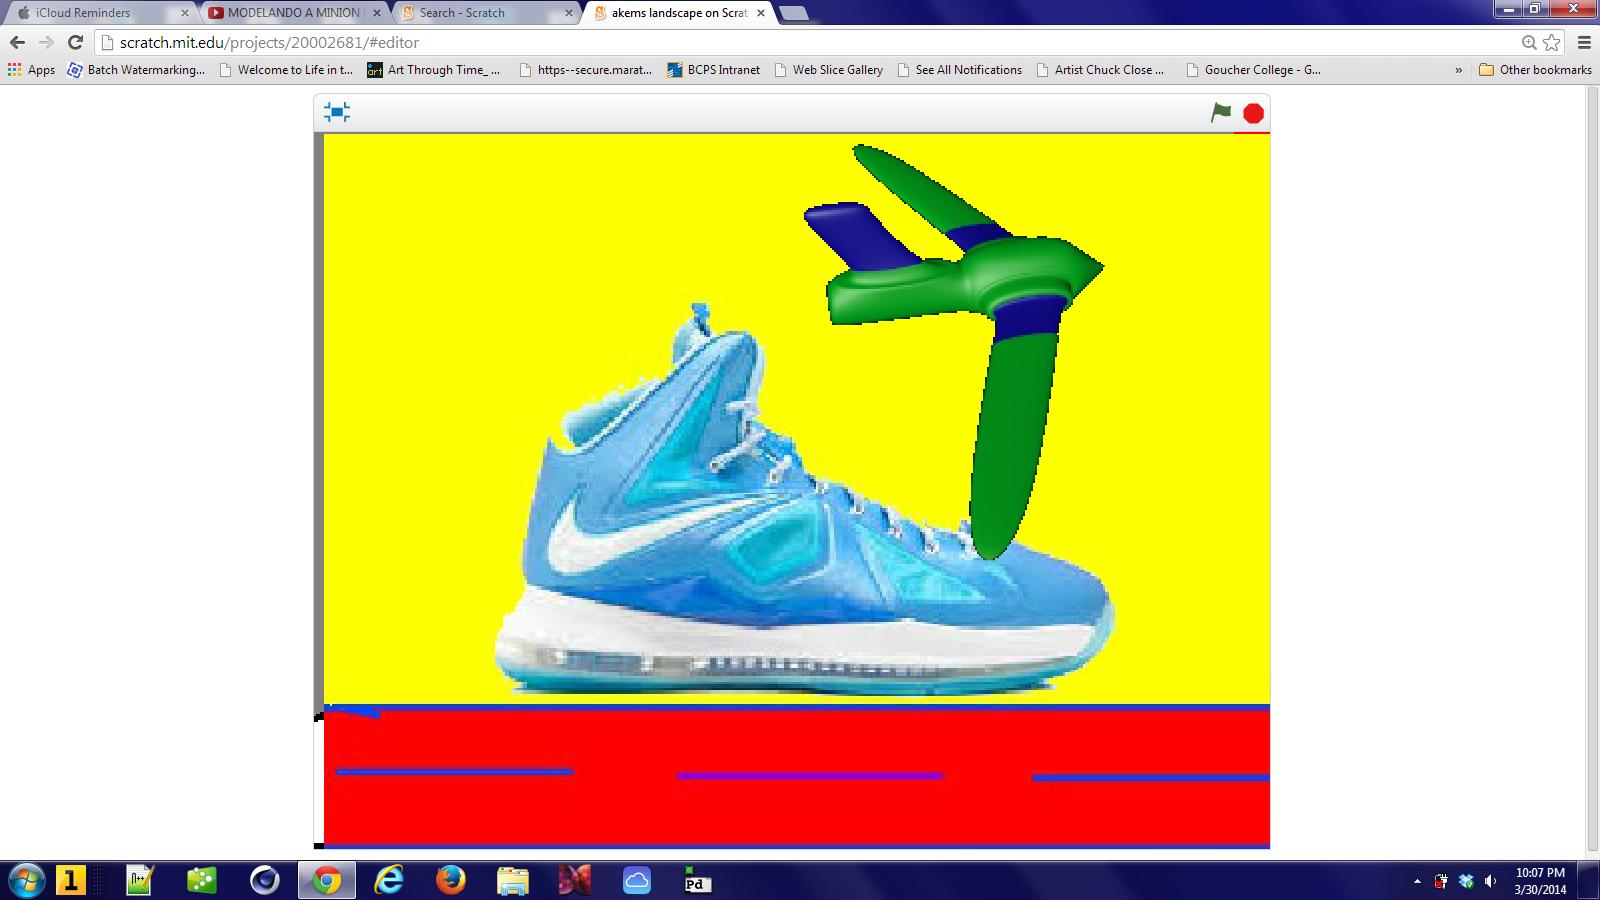 Screenshot 2014-03-30 22.07.45.png